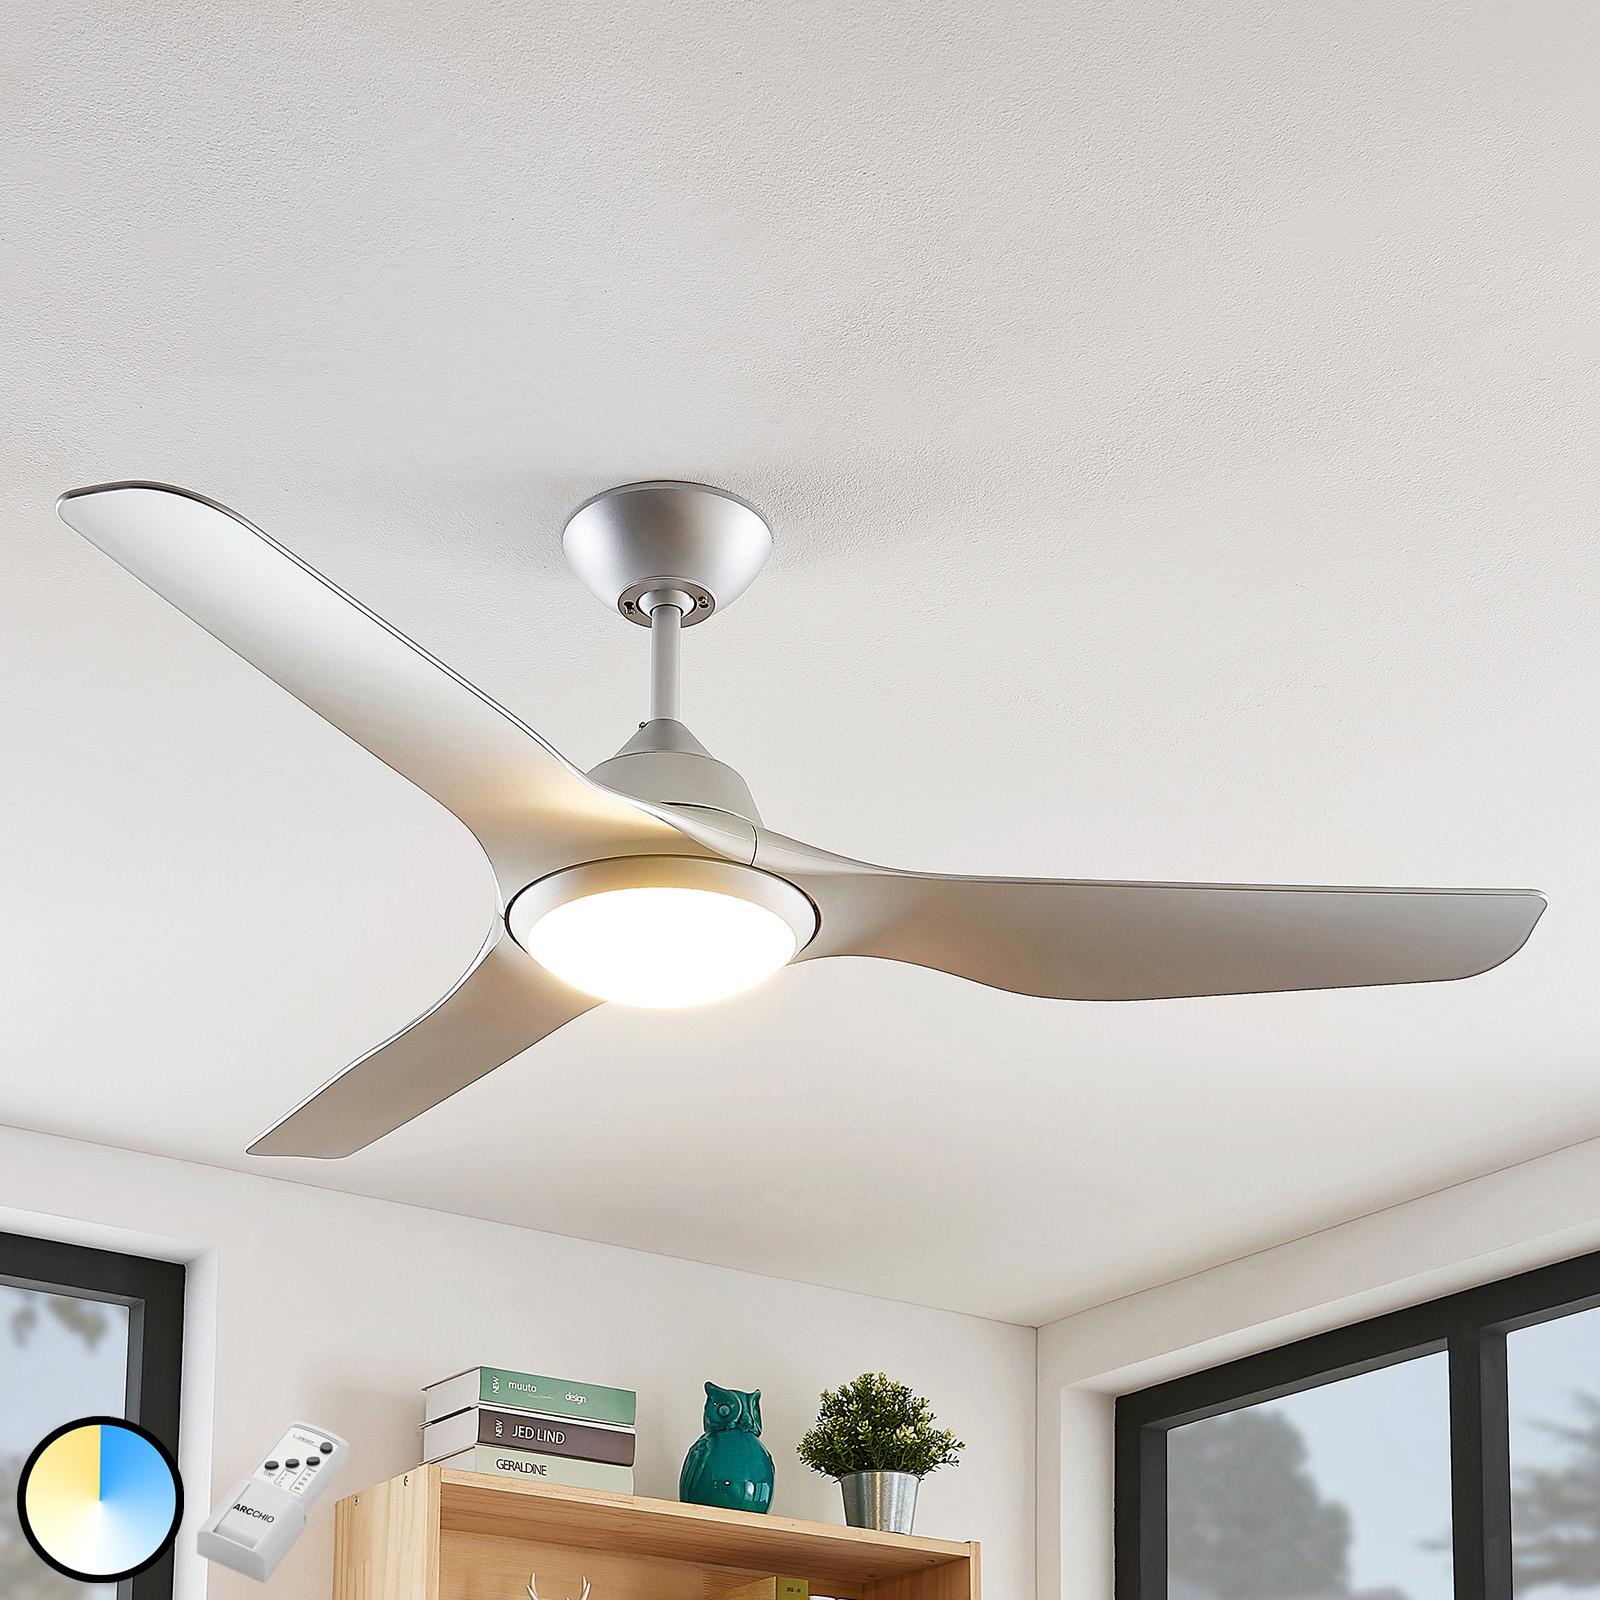 Arcchio Pira ventilatore LED a3 pale, argento